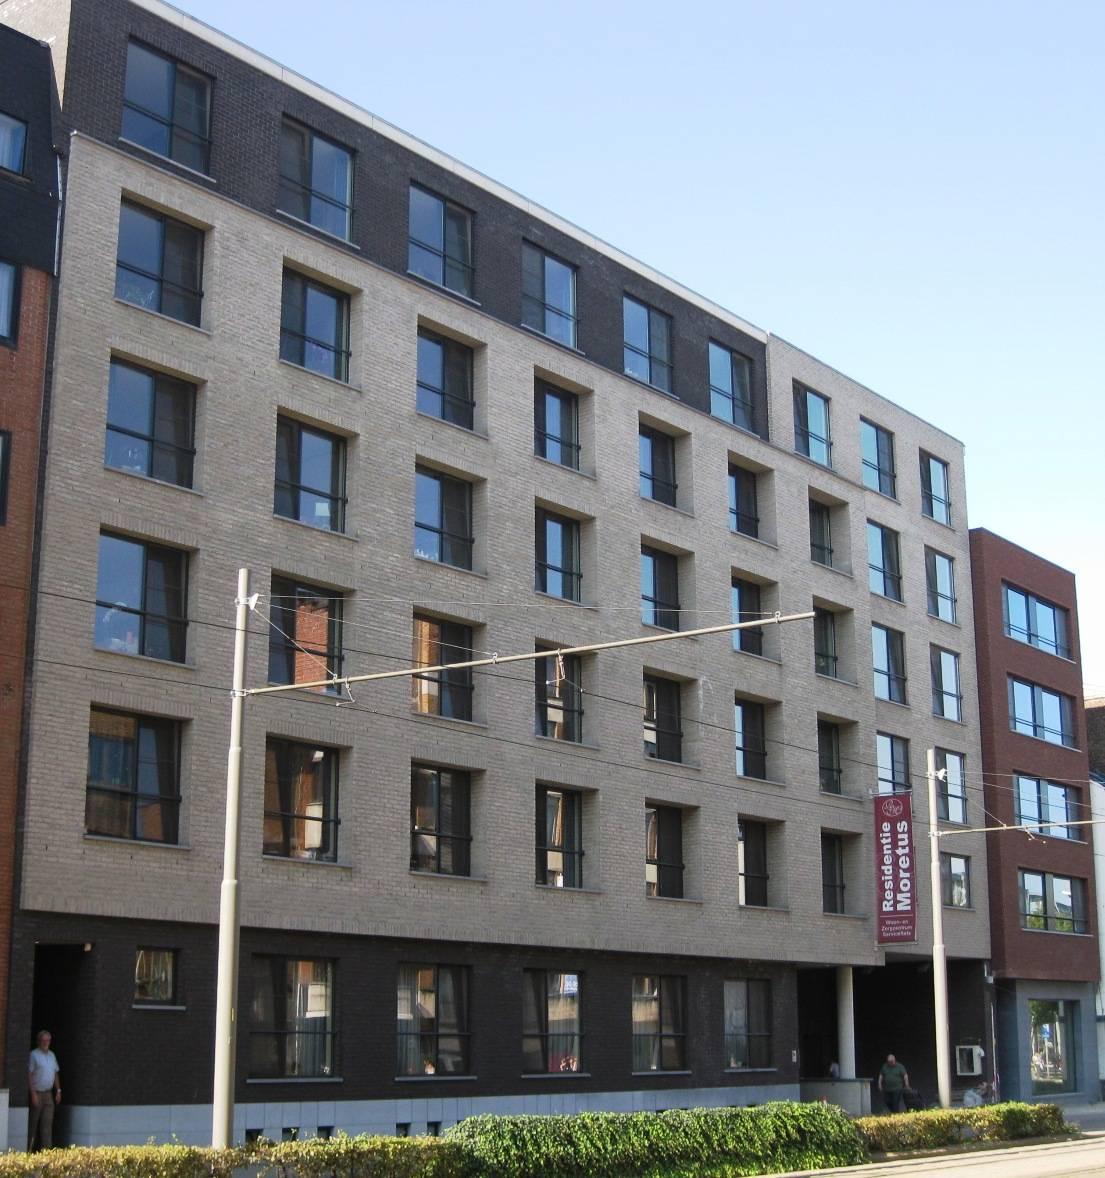 Woon- en zorgcentrum Residentie Moretus foto